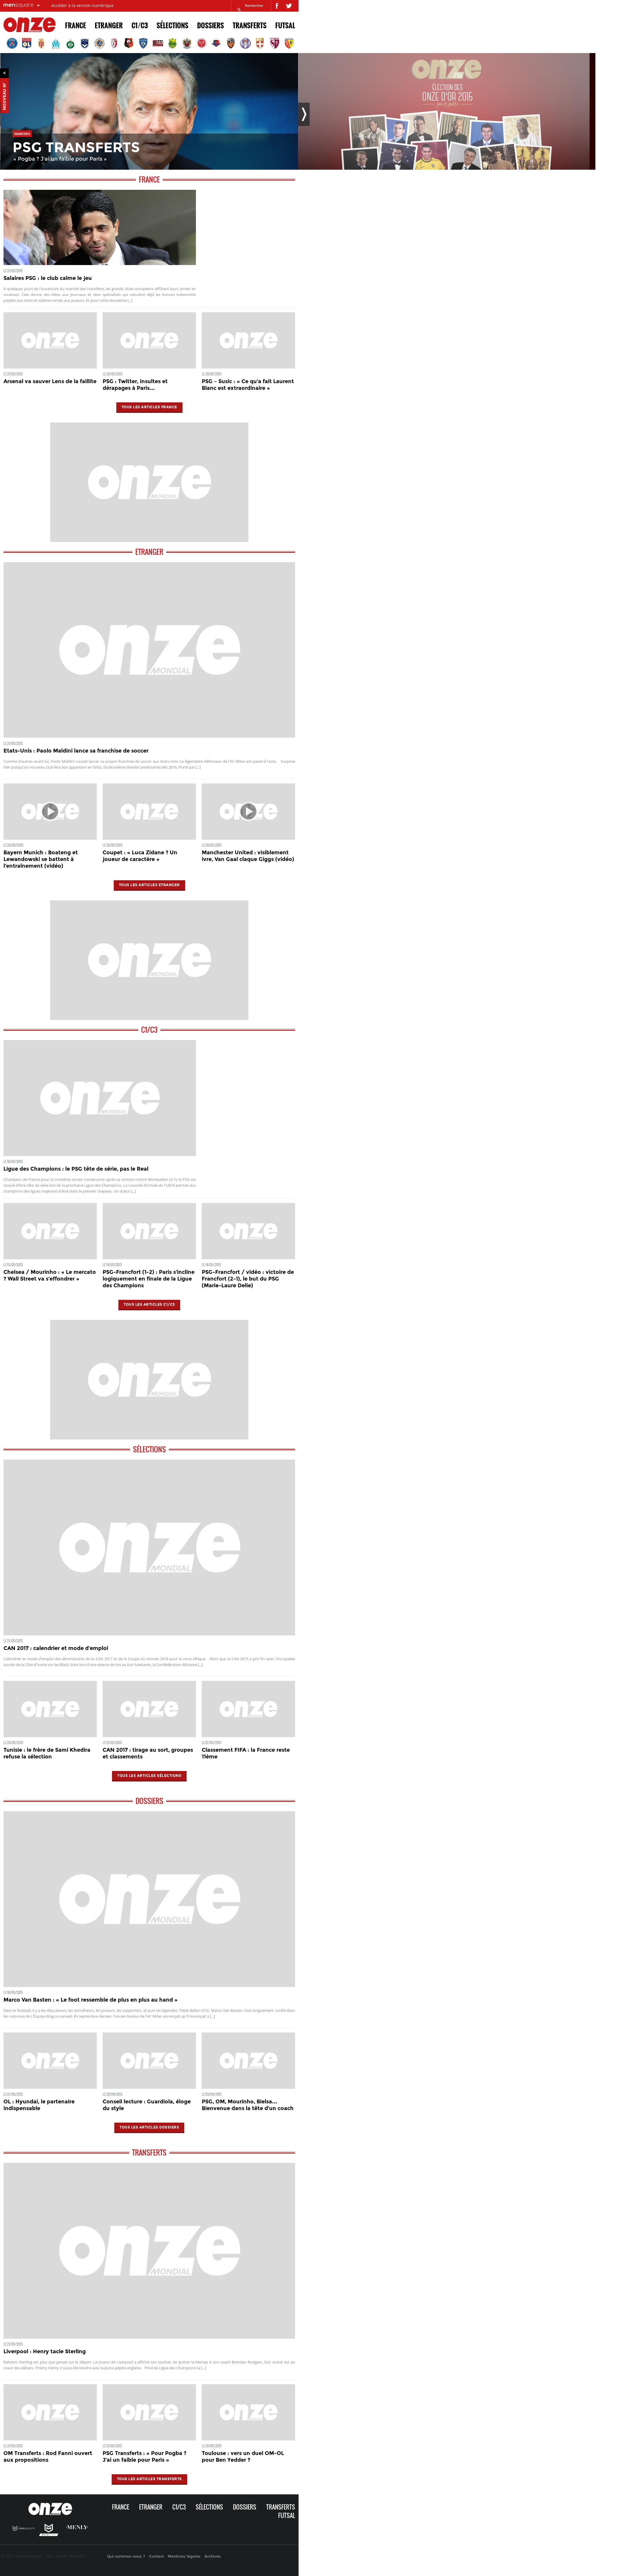 Milan Ac Calendrier.Onze Mondial Page Officielle Competitors Revenue And